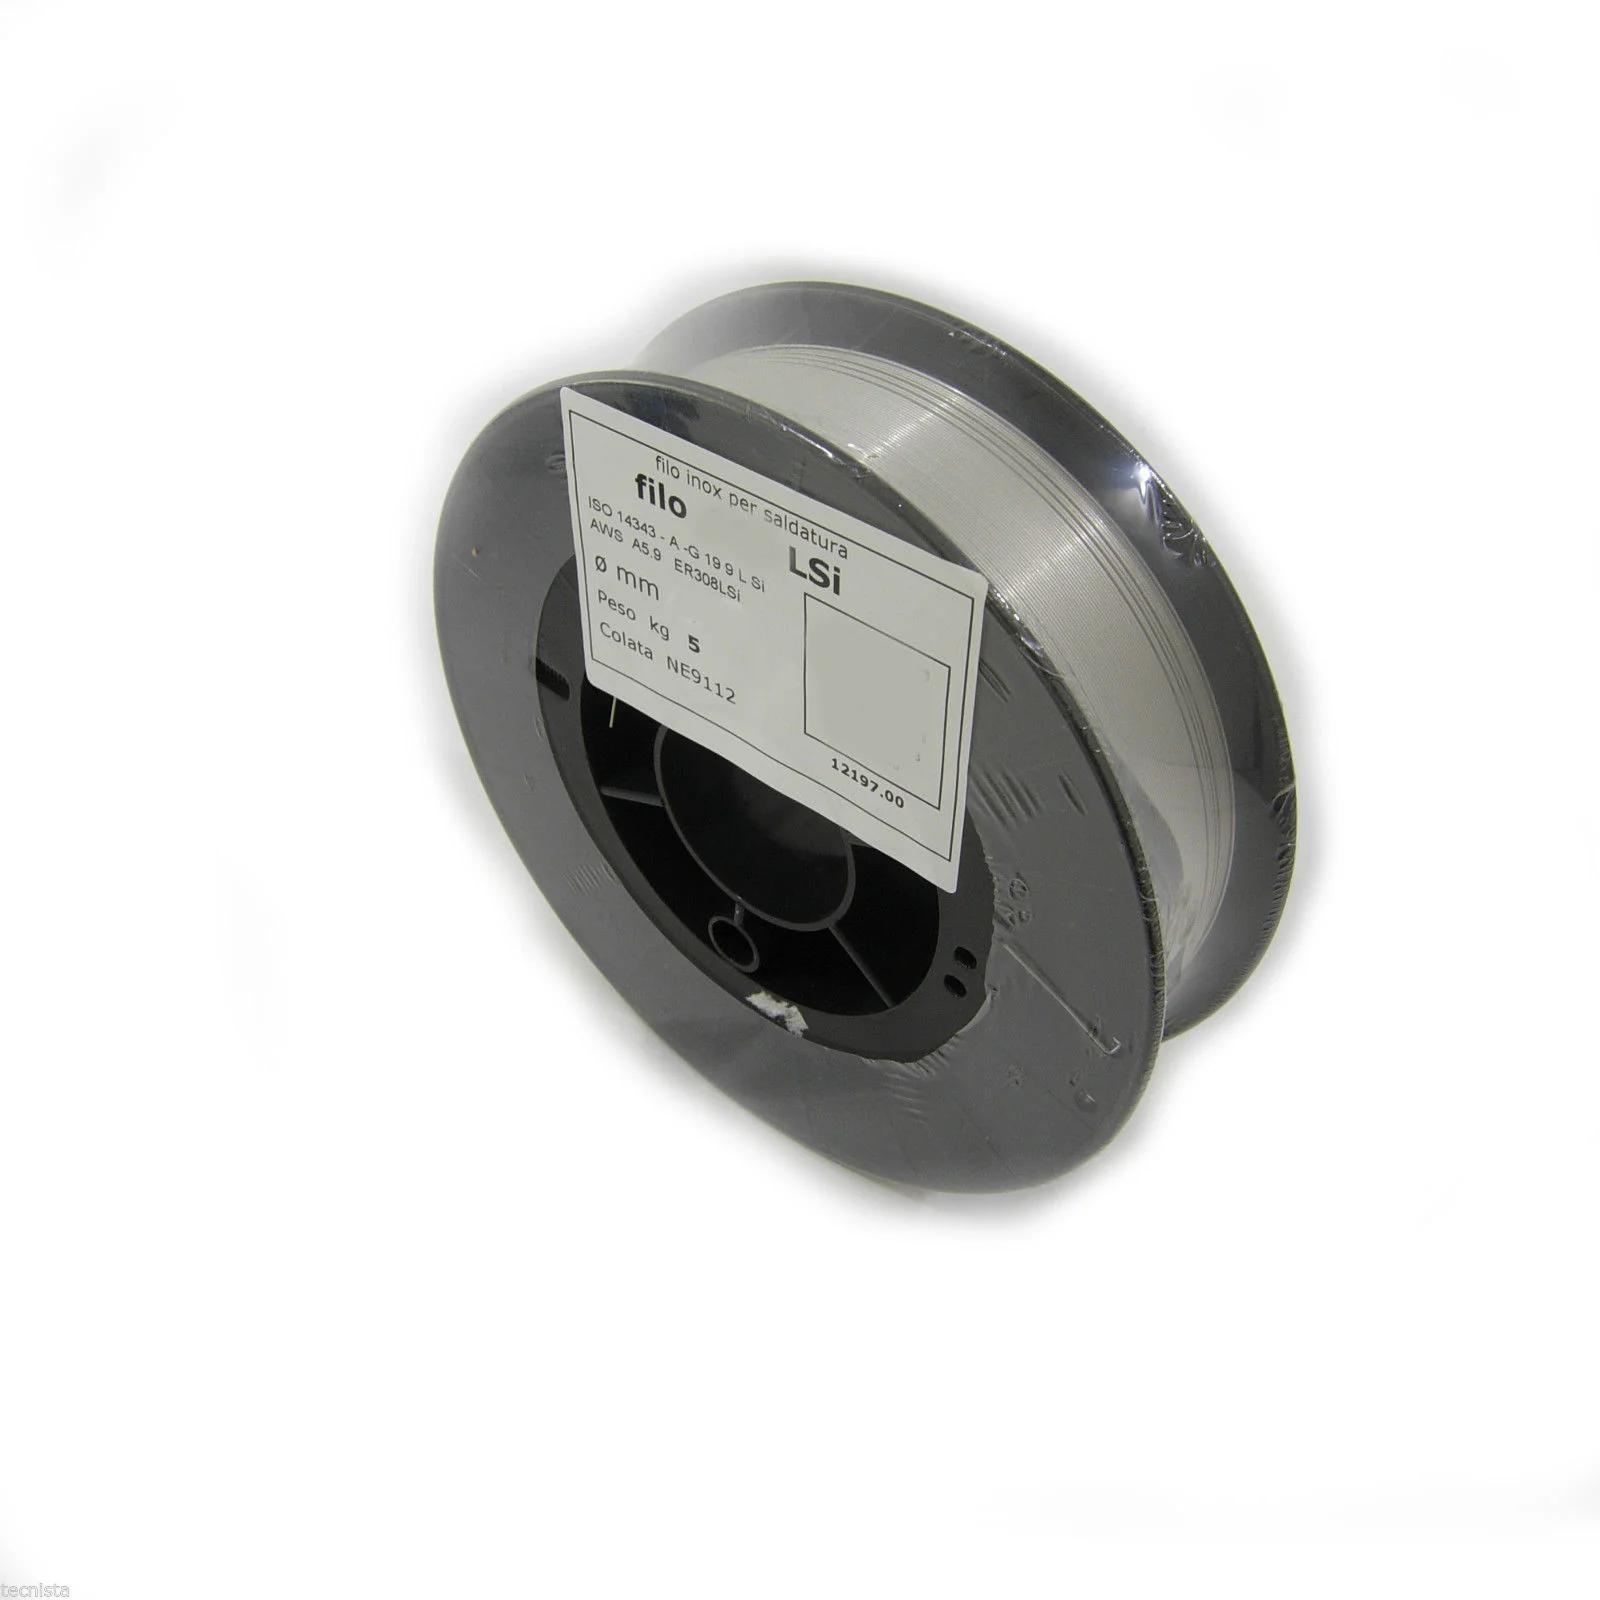 diametro di 0,8 mm 316LSi Filo per saldatura Filo in acciaio inox